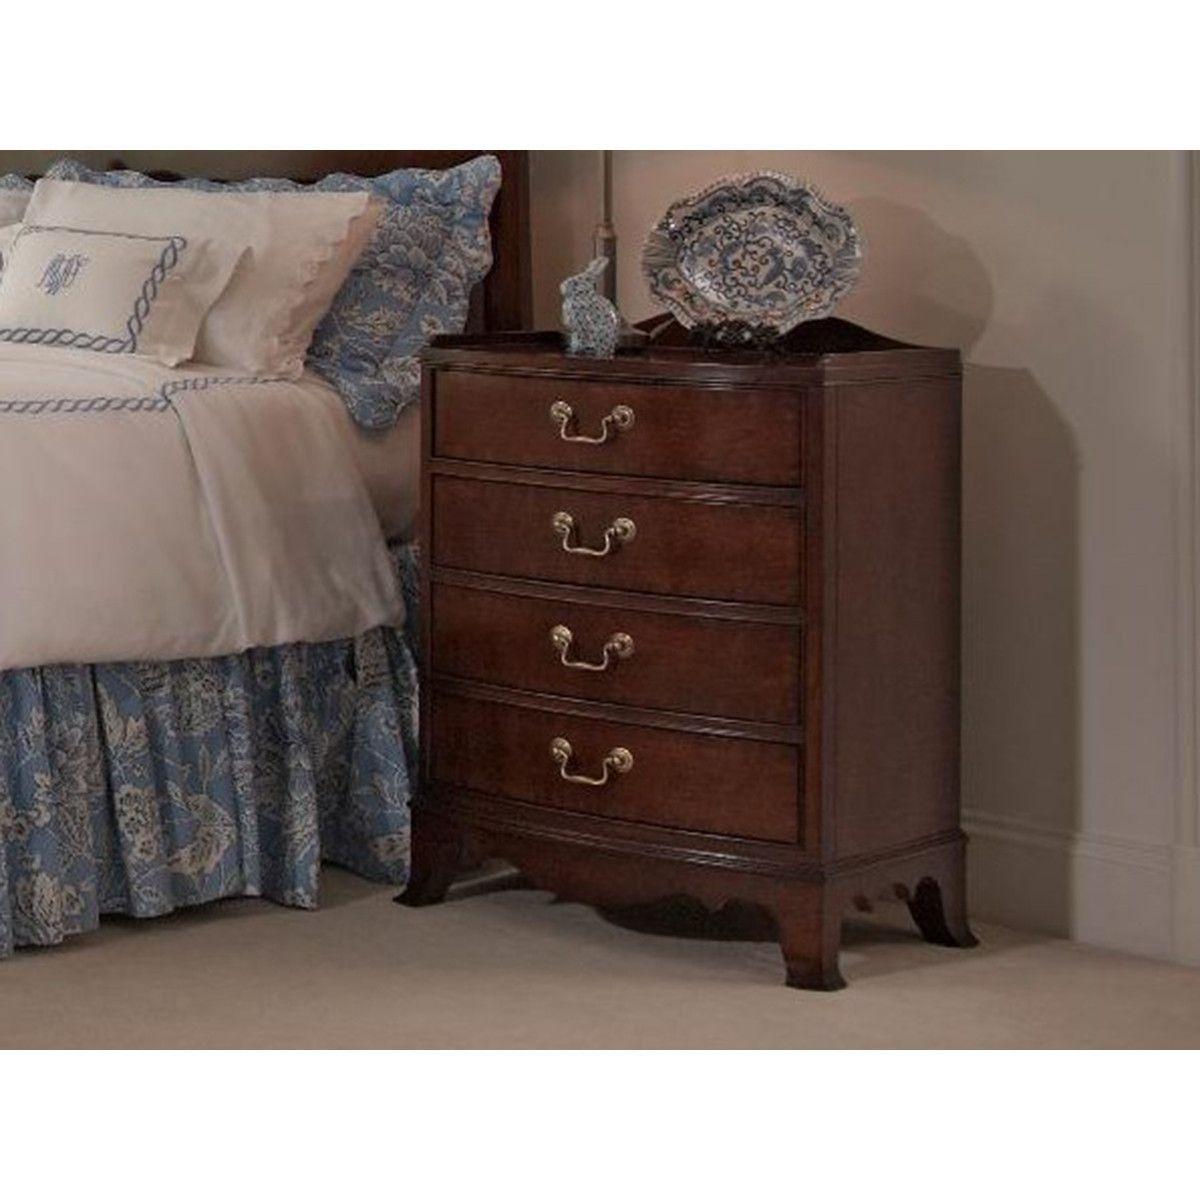 Furniture Design Richmond fine furniture design american cherry richmond bedside table